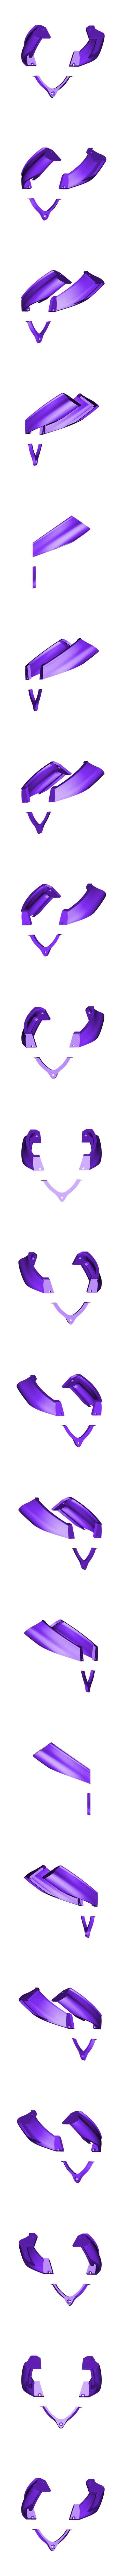 OpenRC_2017_MCL_Center_Color1.stl Download free STL file OpenRC F1 Dual Color McLaren Edition • 3D printer model, DanielNoree